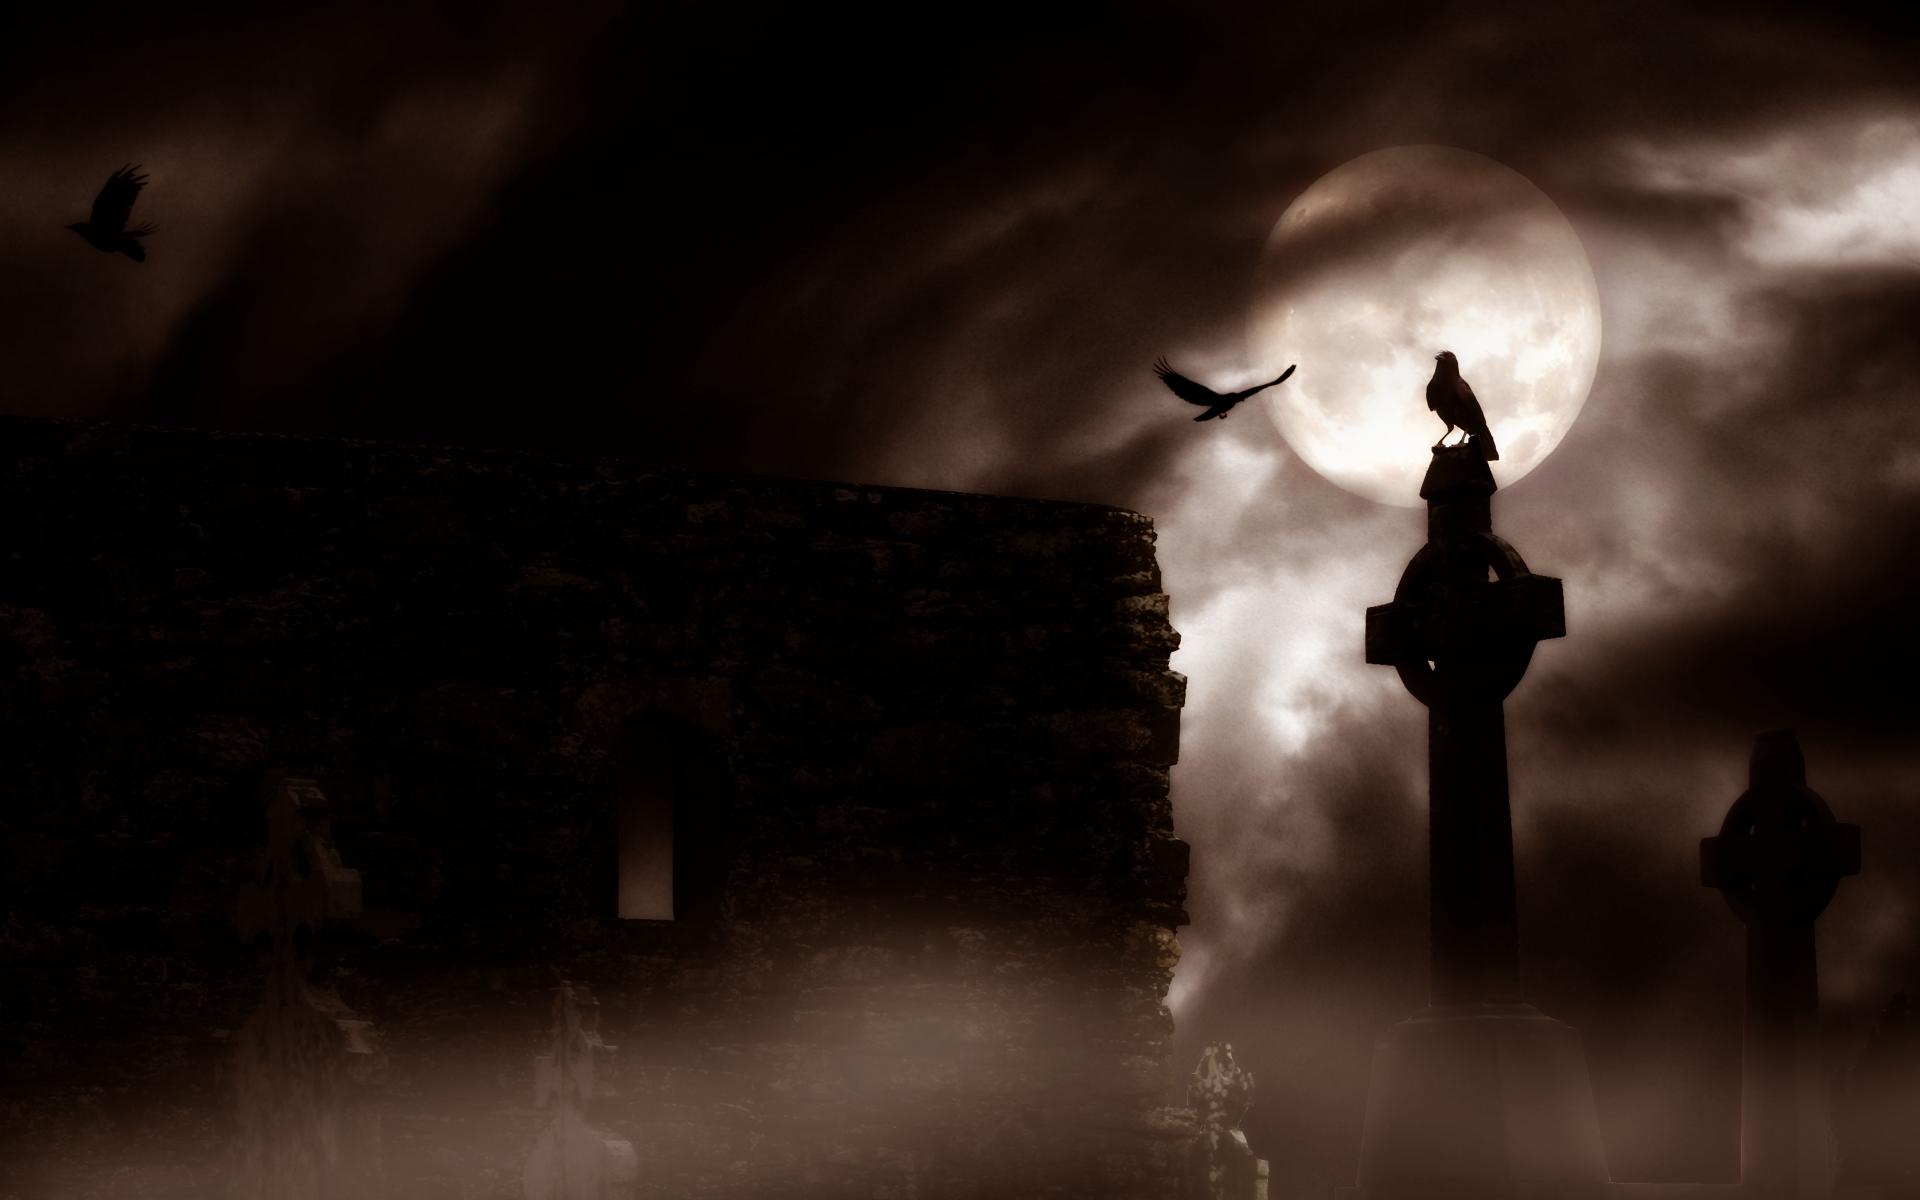 Dark Gothic Backgrounds wallpaper   892992 1920x1200